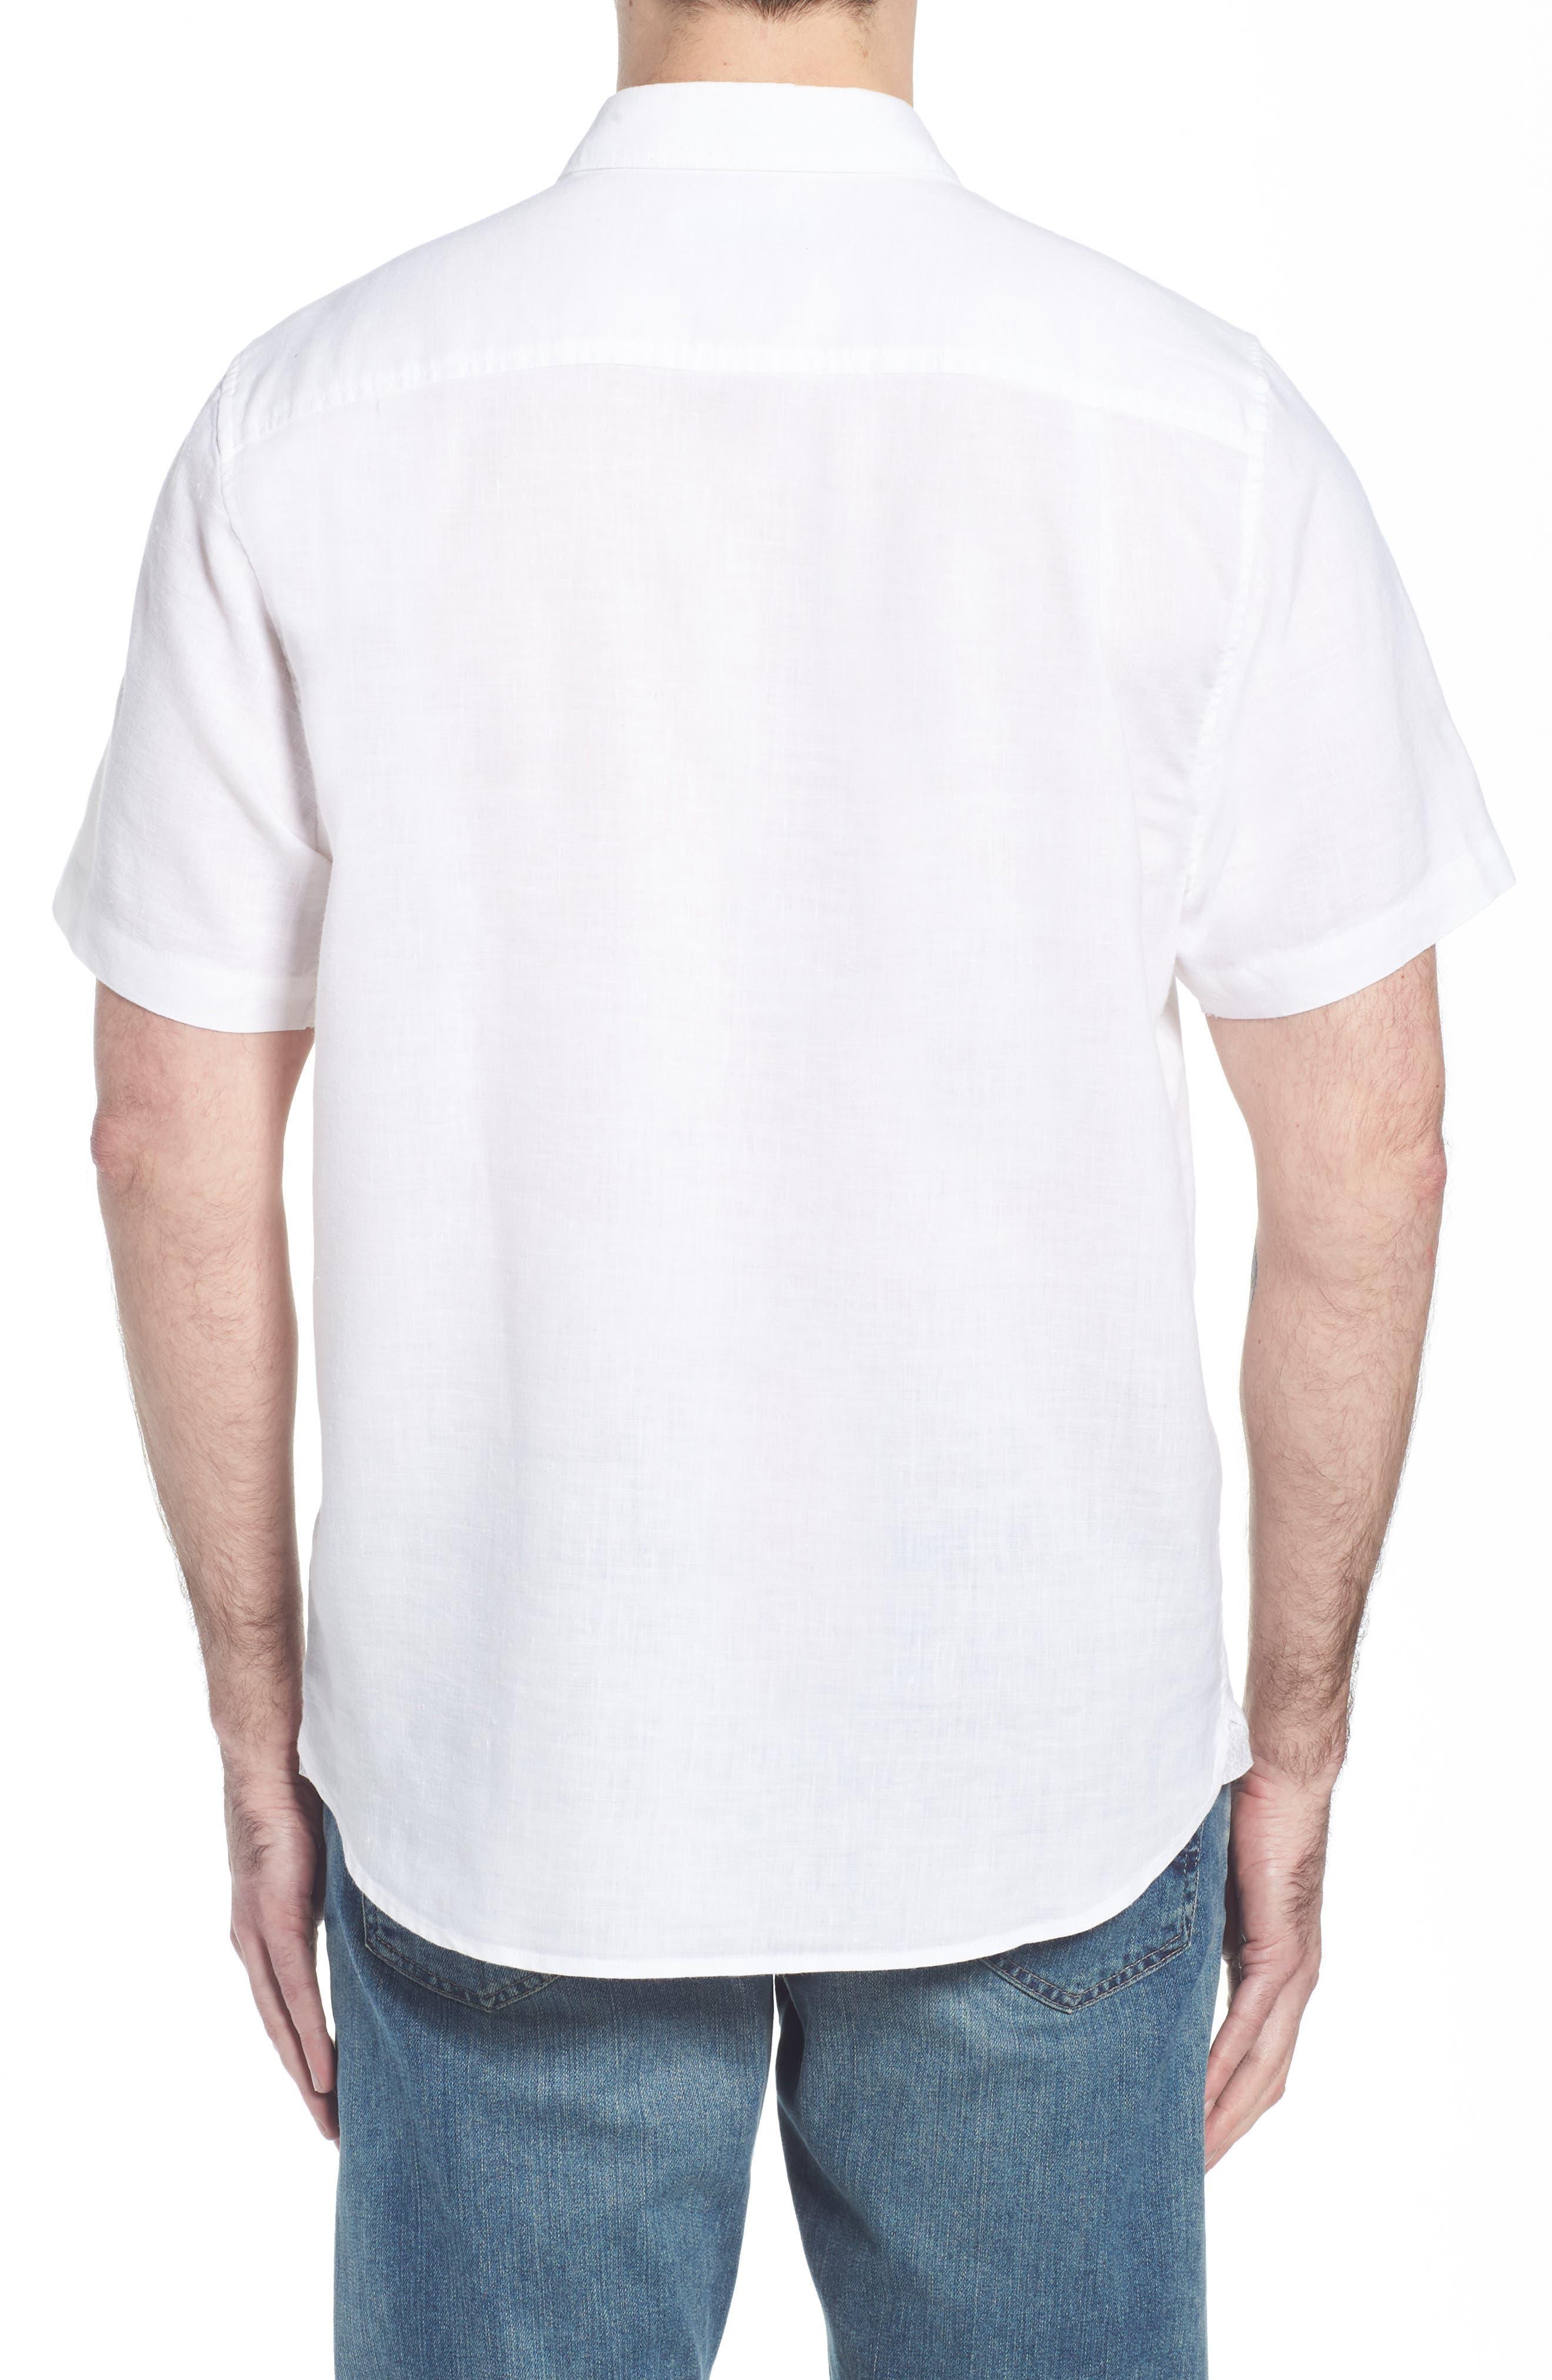 Lanai Tides Linen Blend Sport Shirt,                             Alternate thumbnail 2, color,                             100